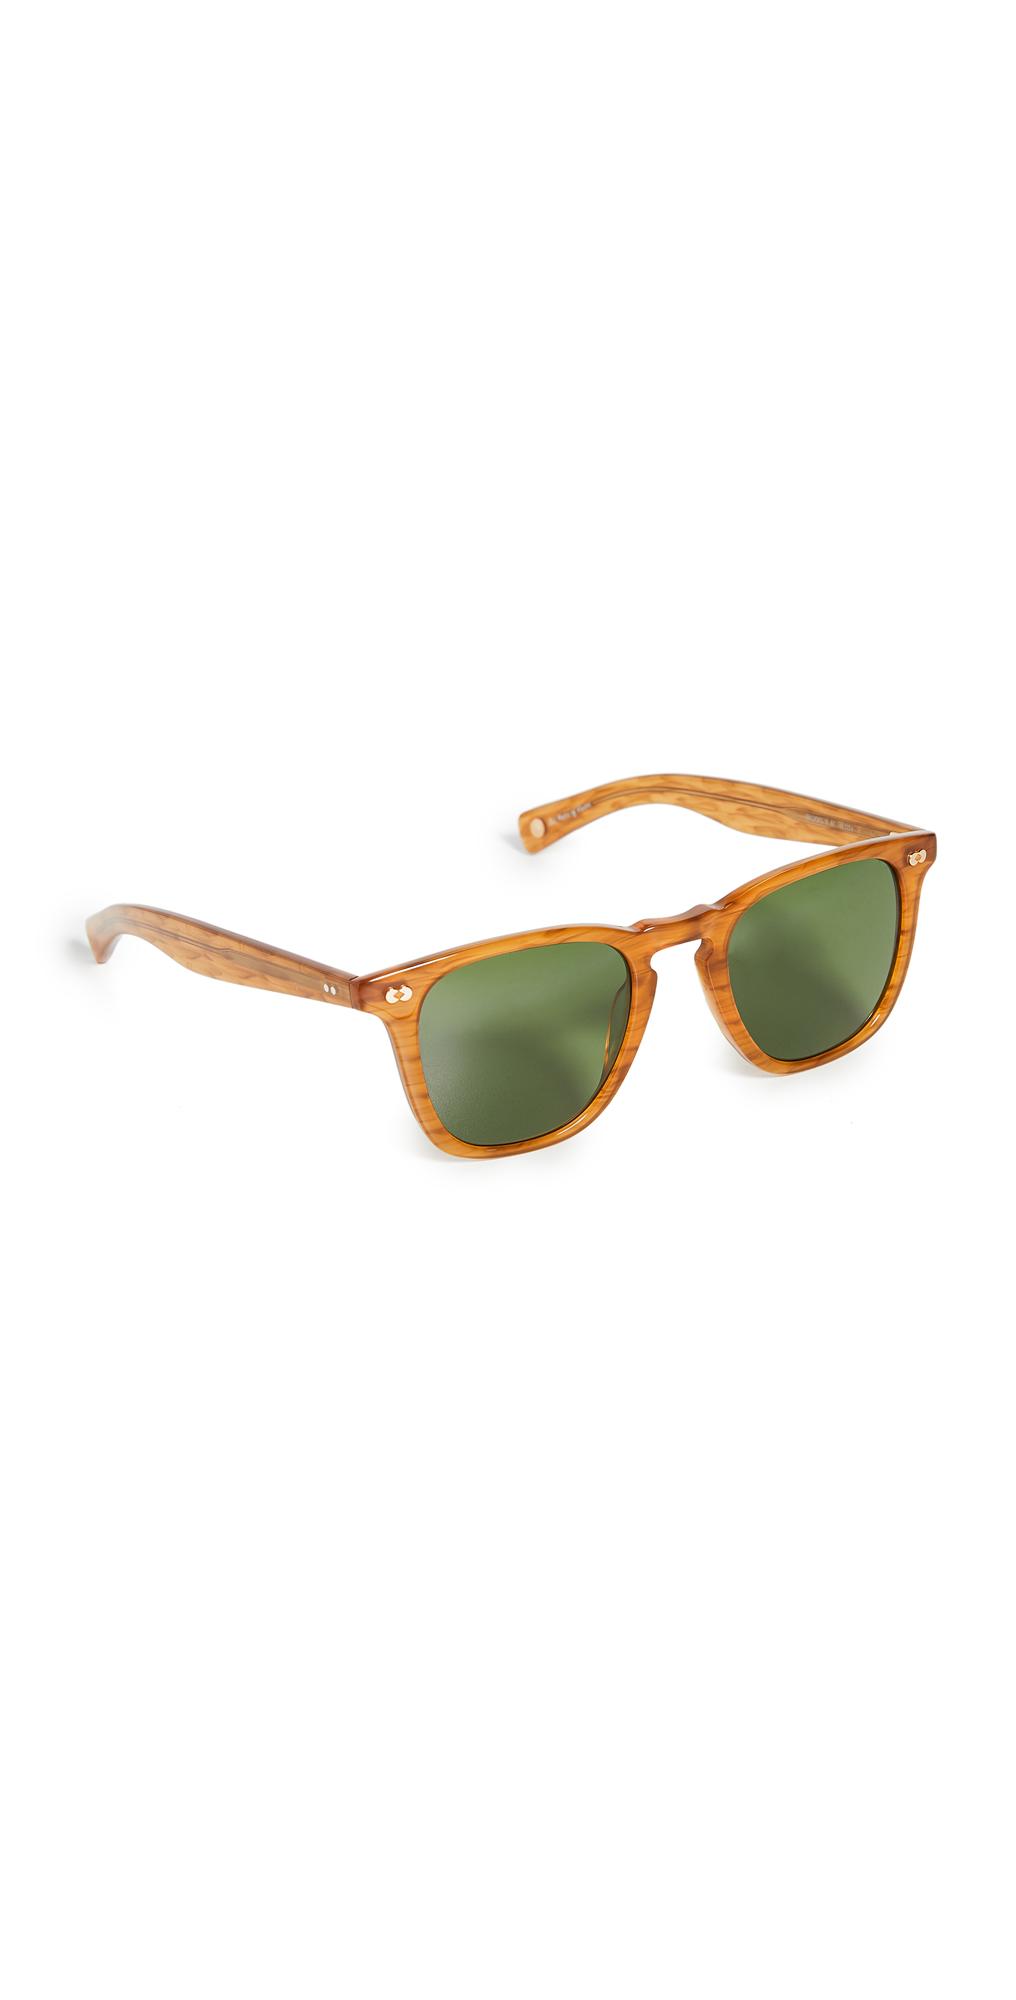 Brooks X 48mm Sunglasses